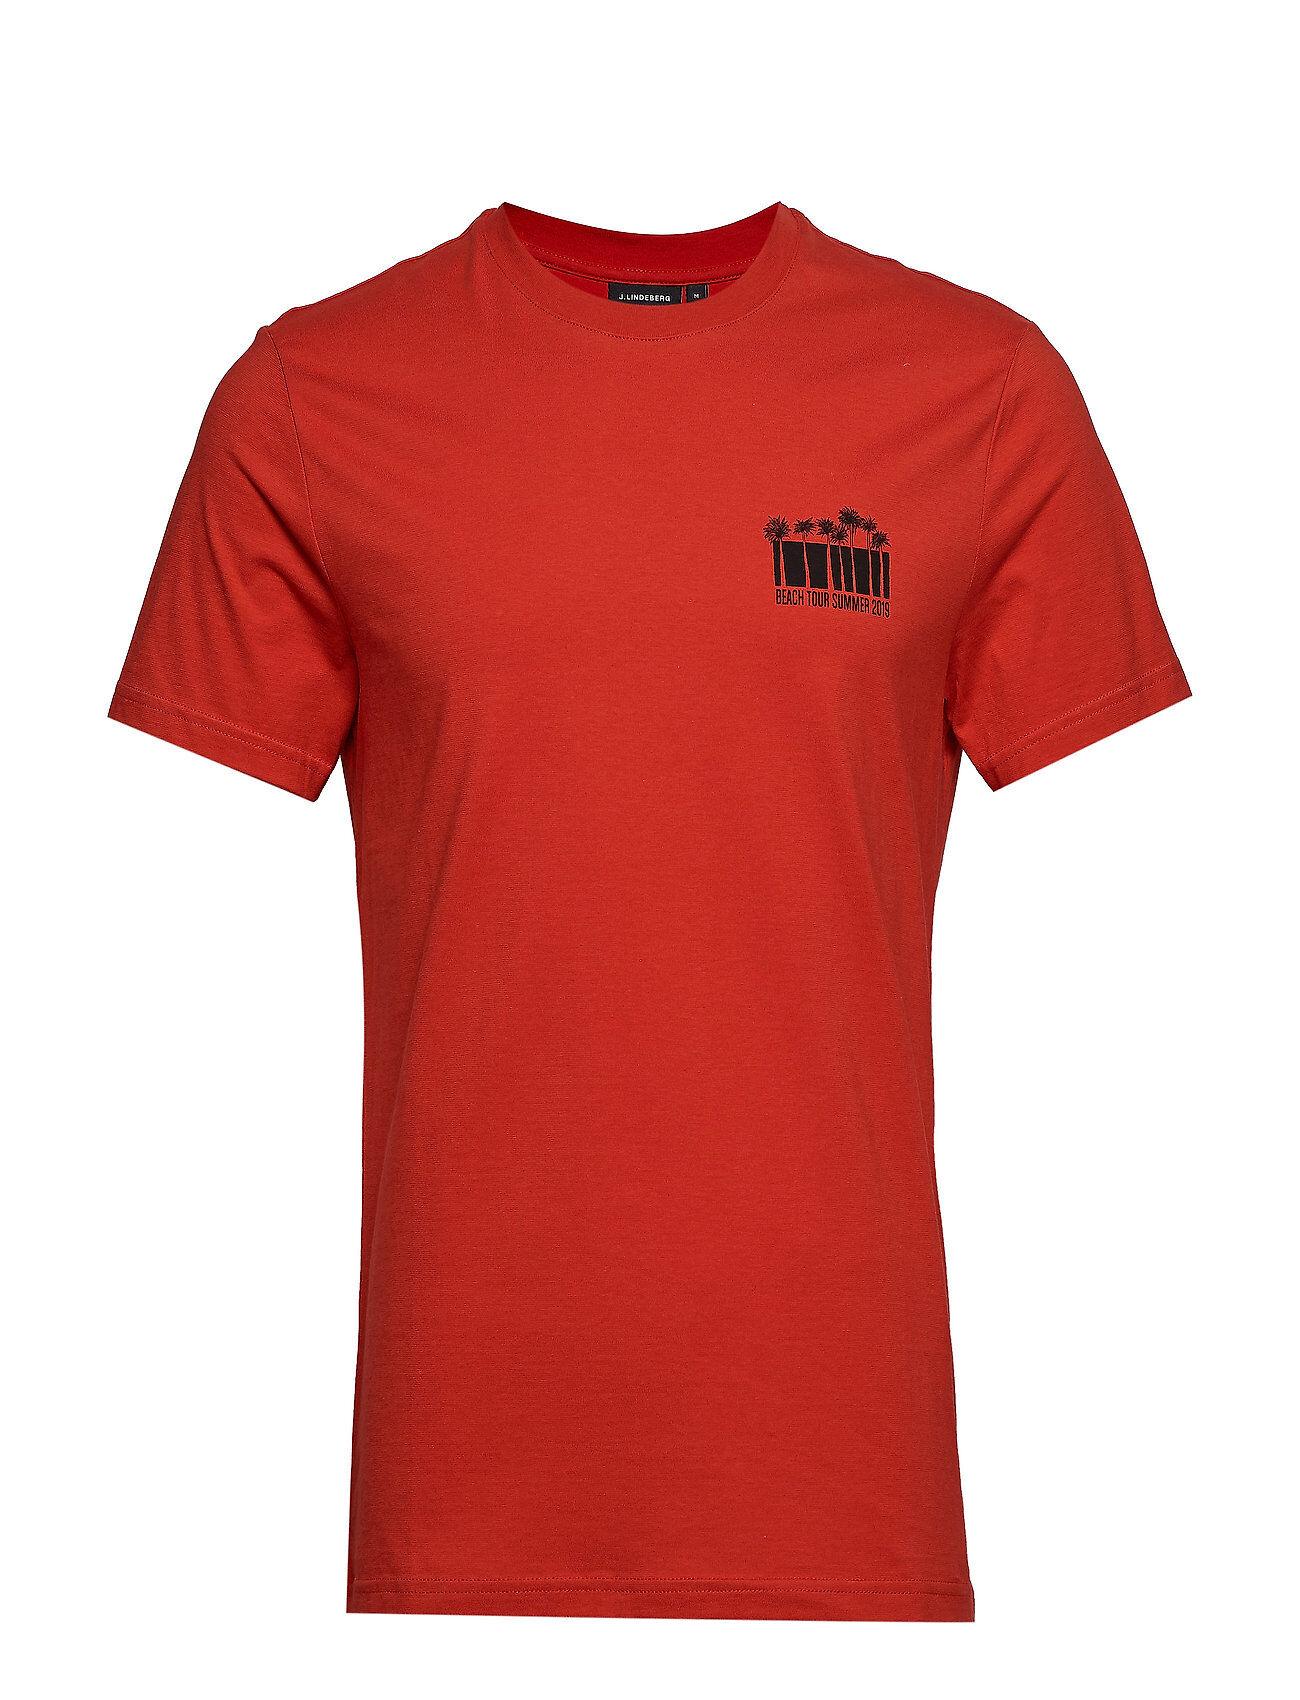 J. Lindeberg Brand Tee Bridge S Jersey T-shirts Short-sleeved Punainen